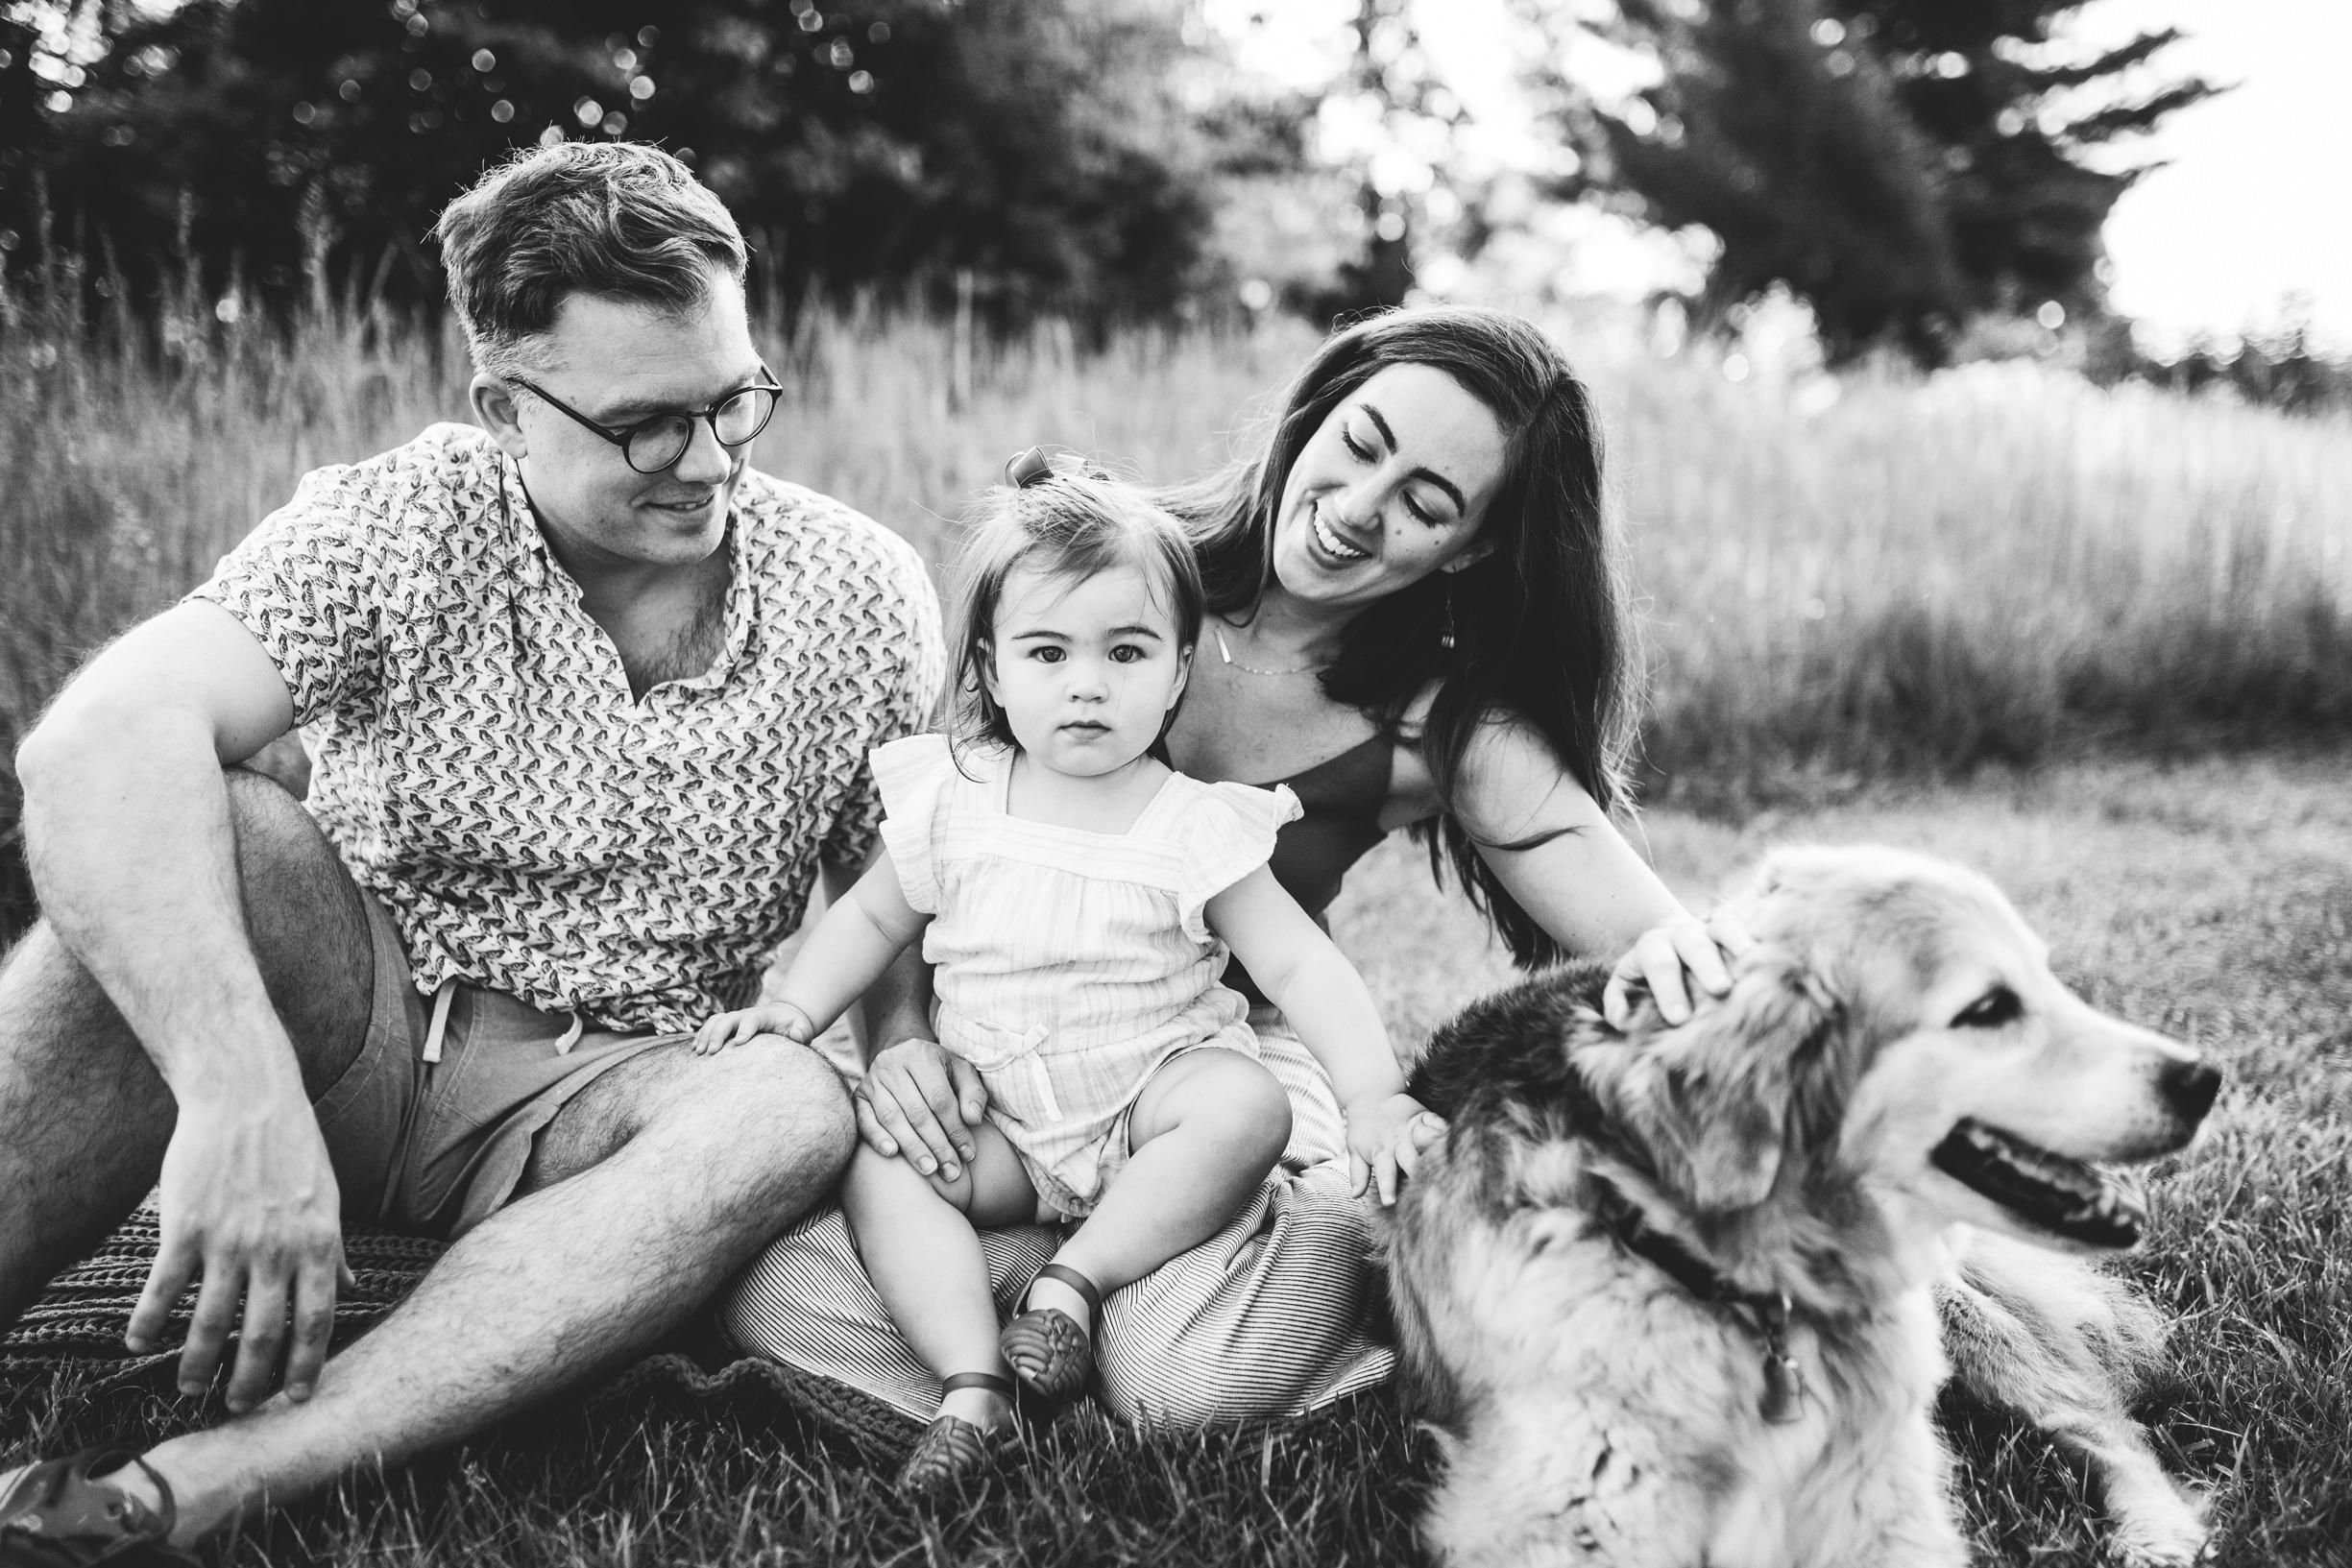 louisville-family-photographer-kentucky-crystal-ludwick-photo (38 of 45).jpg